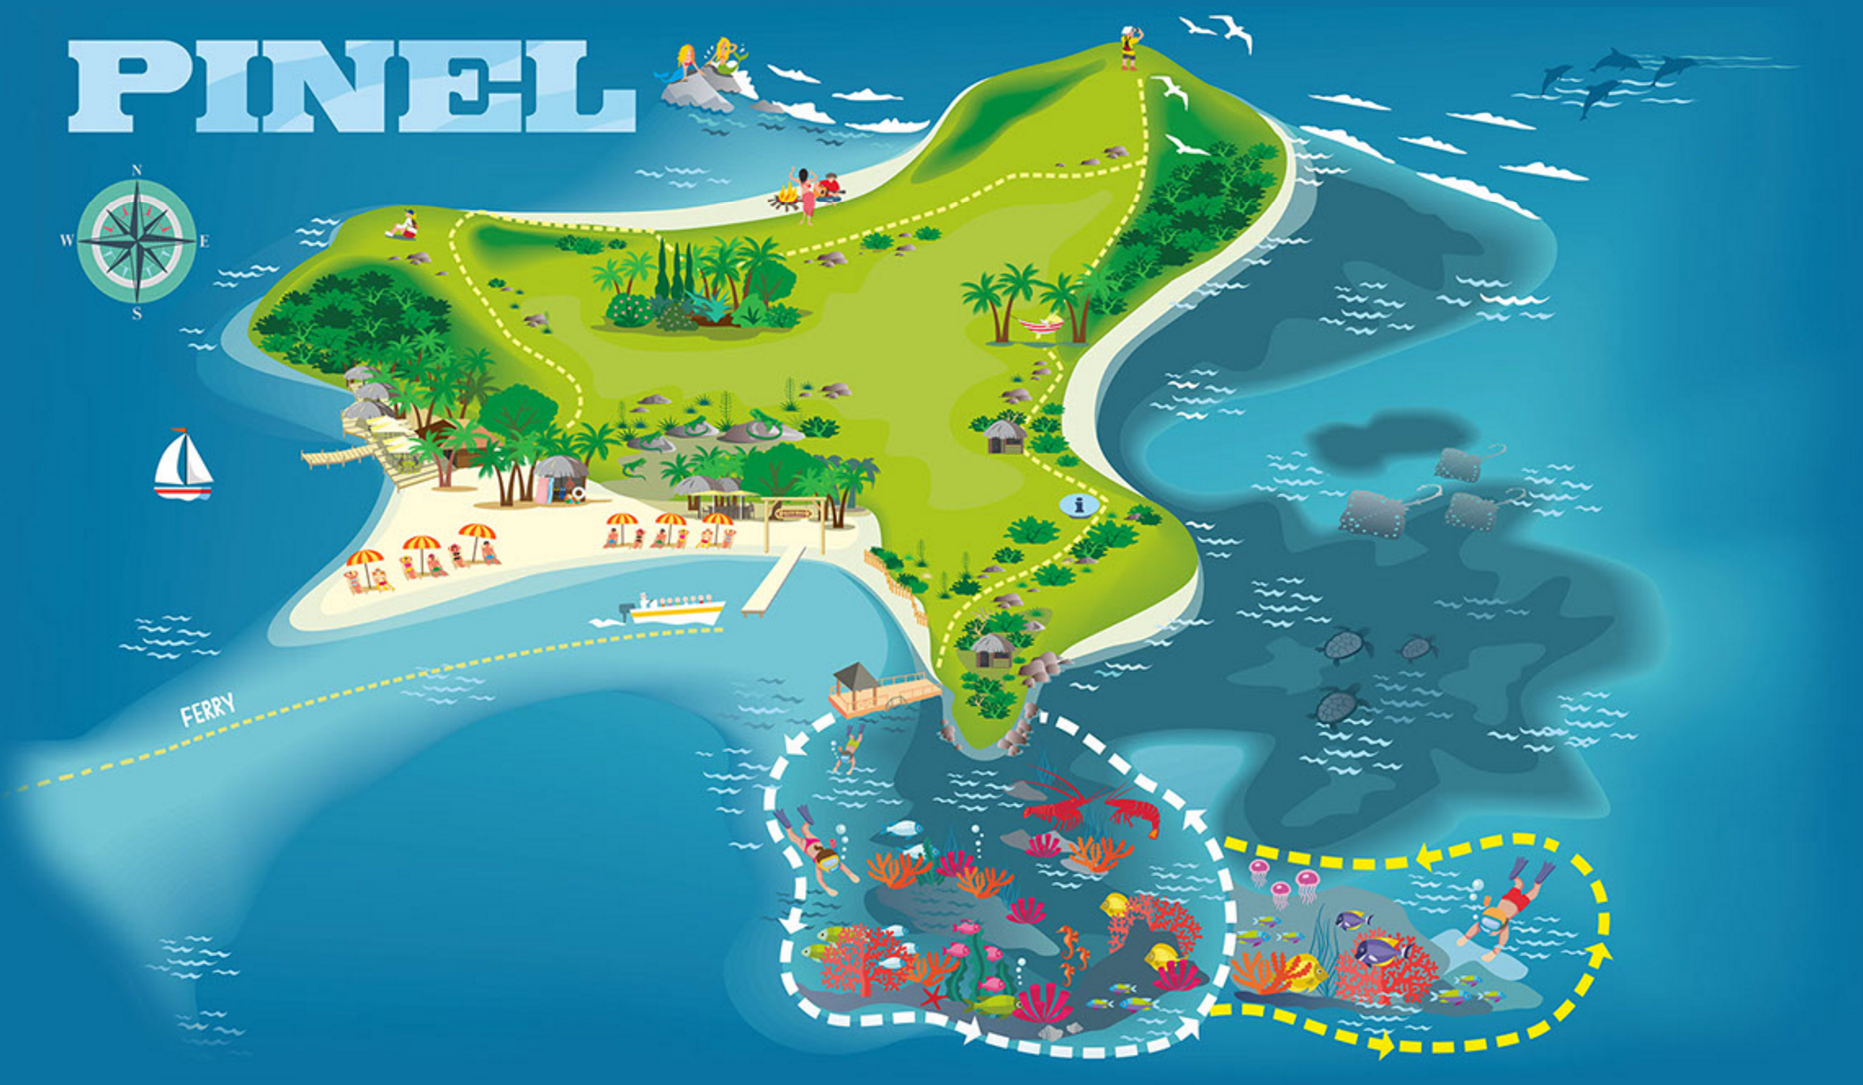 pinel-island-map